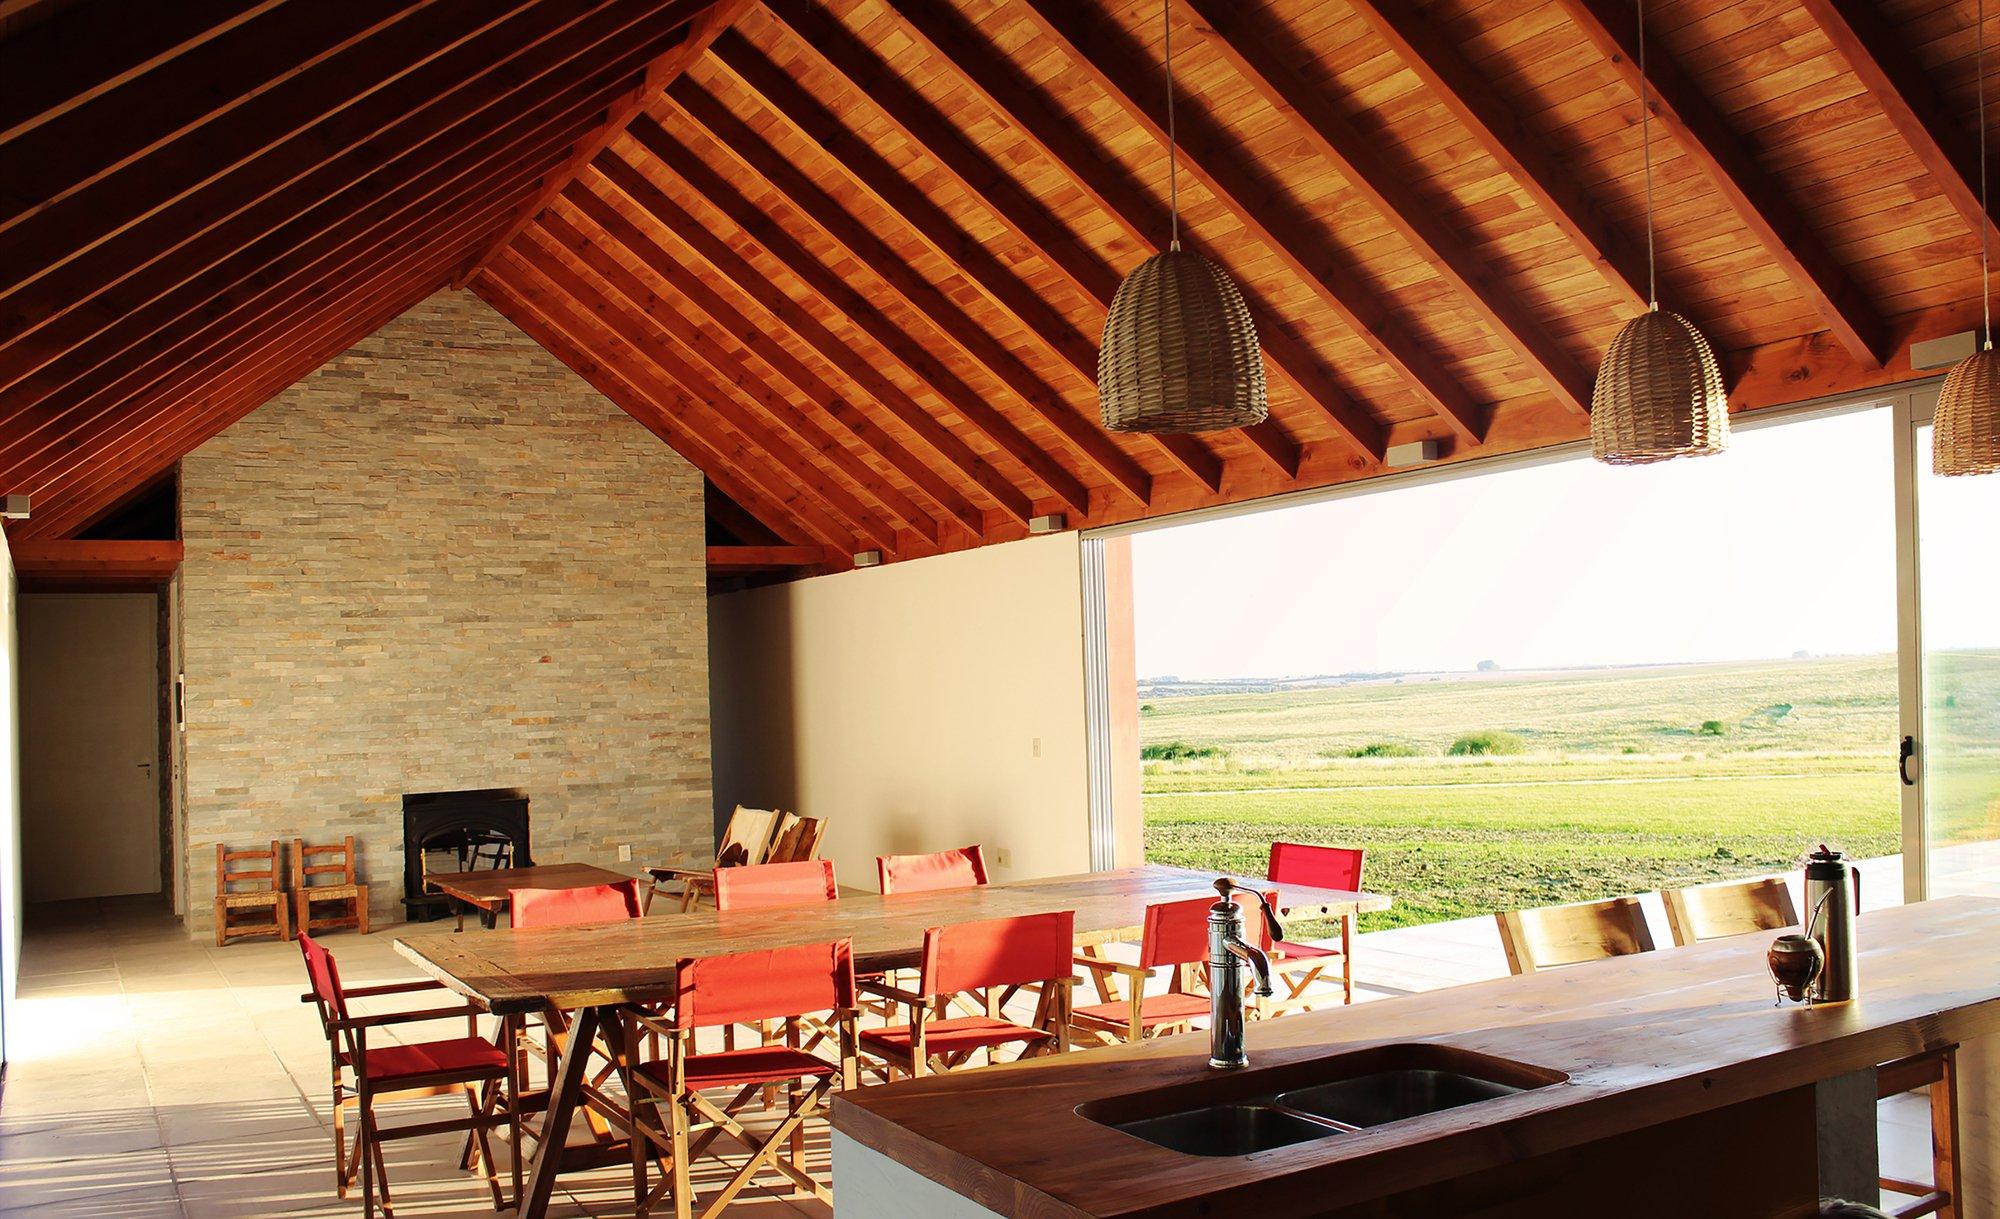 Exquisite simplicity La Lunera House, Soriano - Uruguay - the vandallist (1)